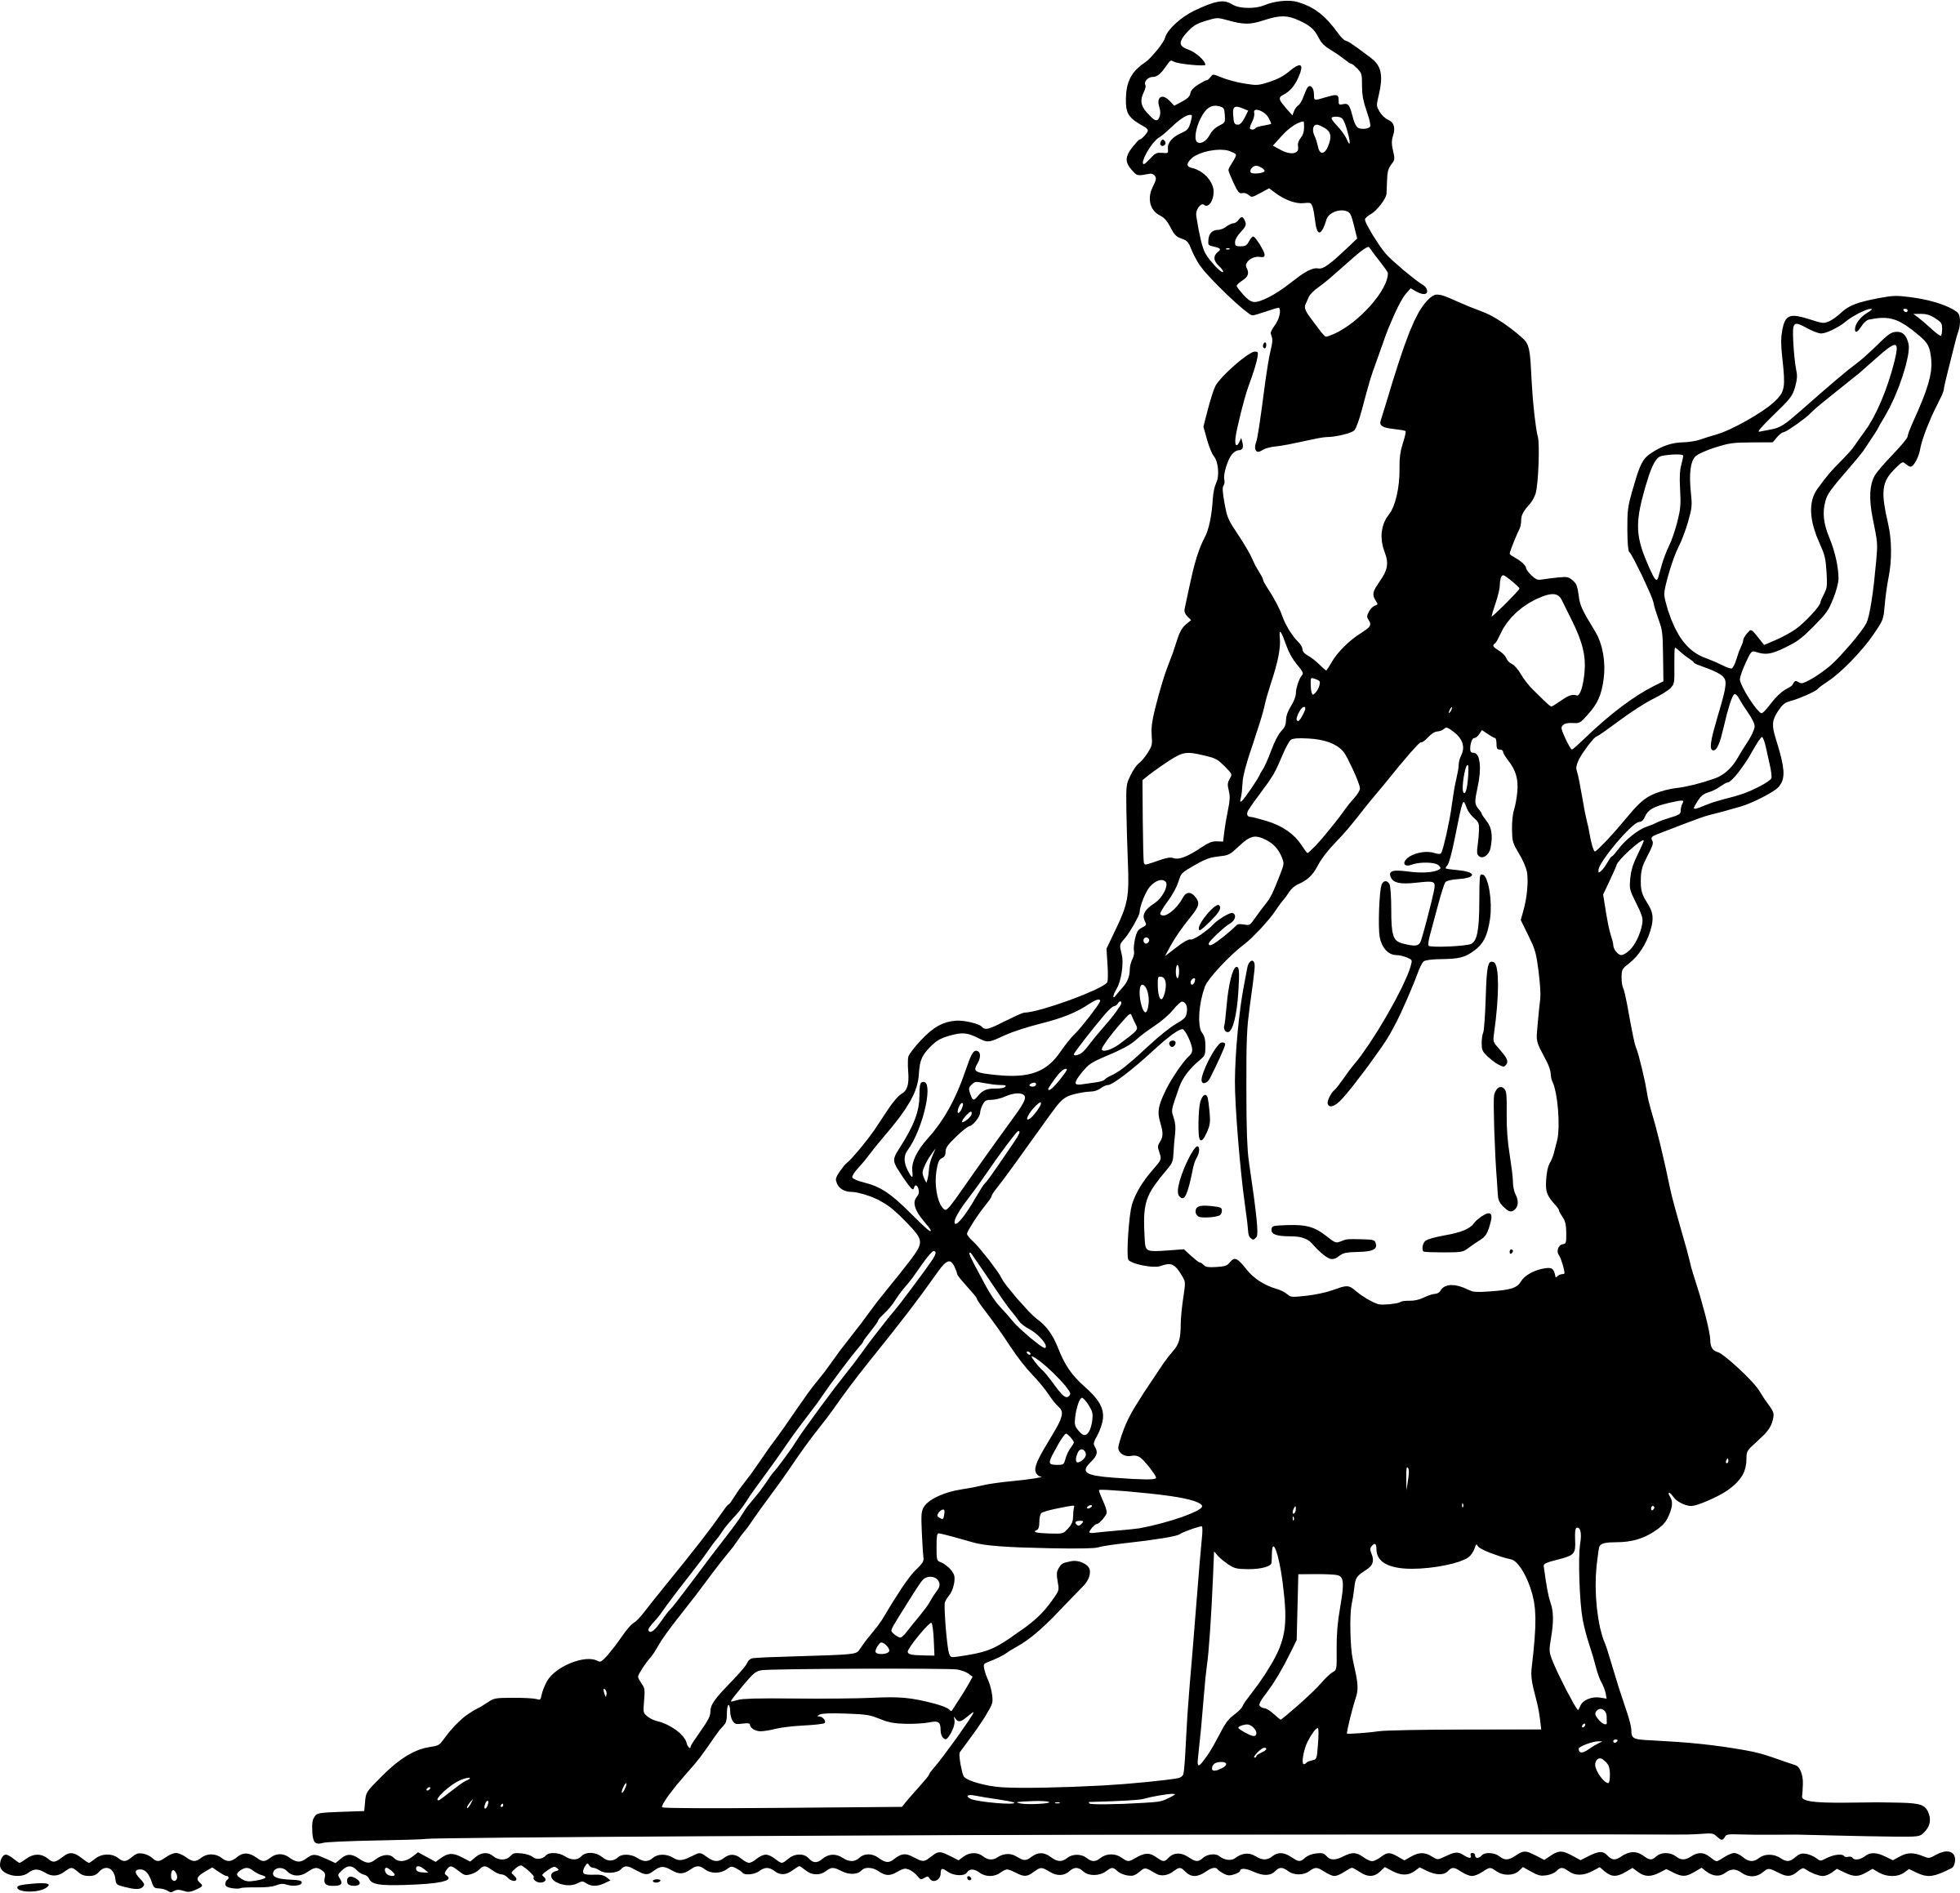 F besides 578437497 besides A2 71 55 01300000328702123065551498967 in addition Vysivana La a Madeira Velke Kvety moreover Shiro 2. on 31